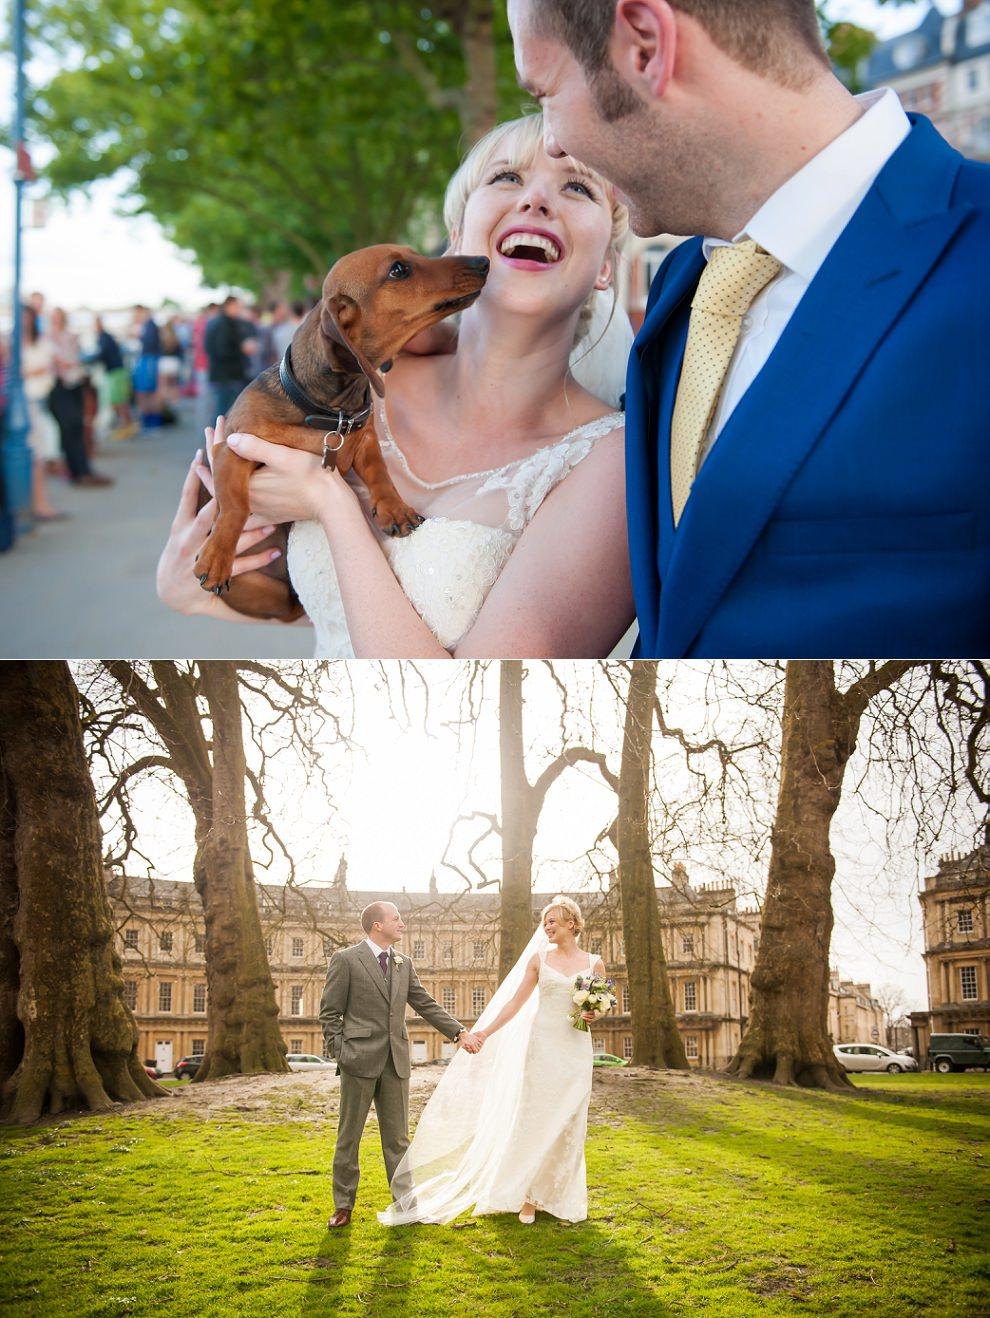 Best-wedding-photos-UK-2015-096